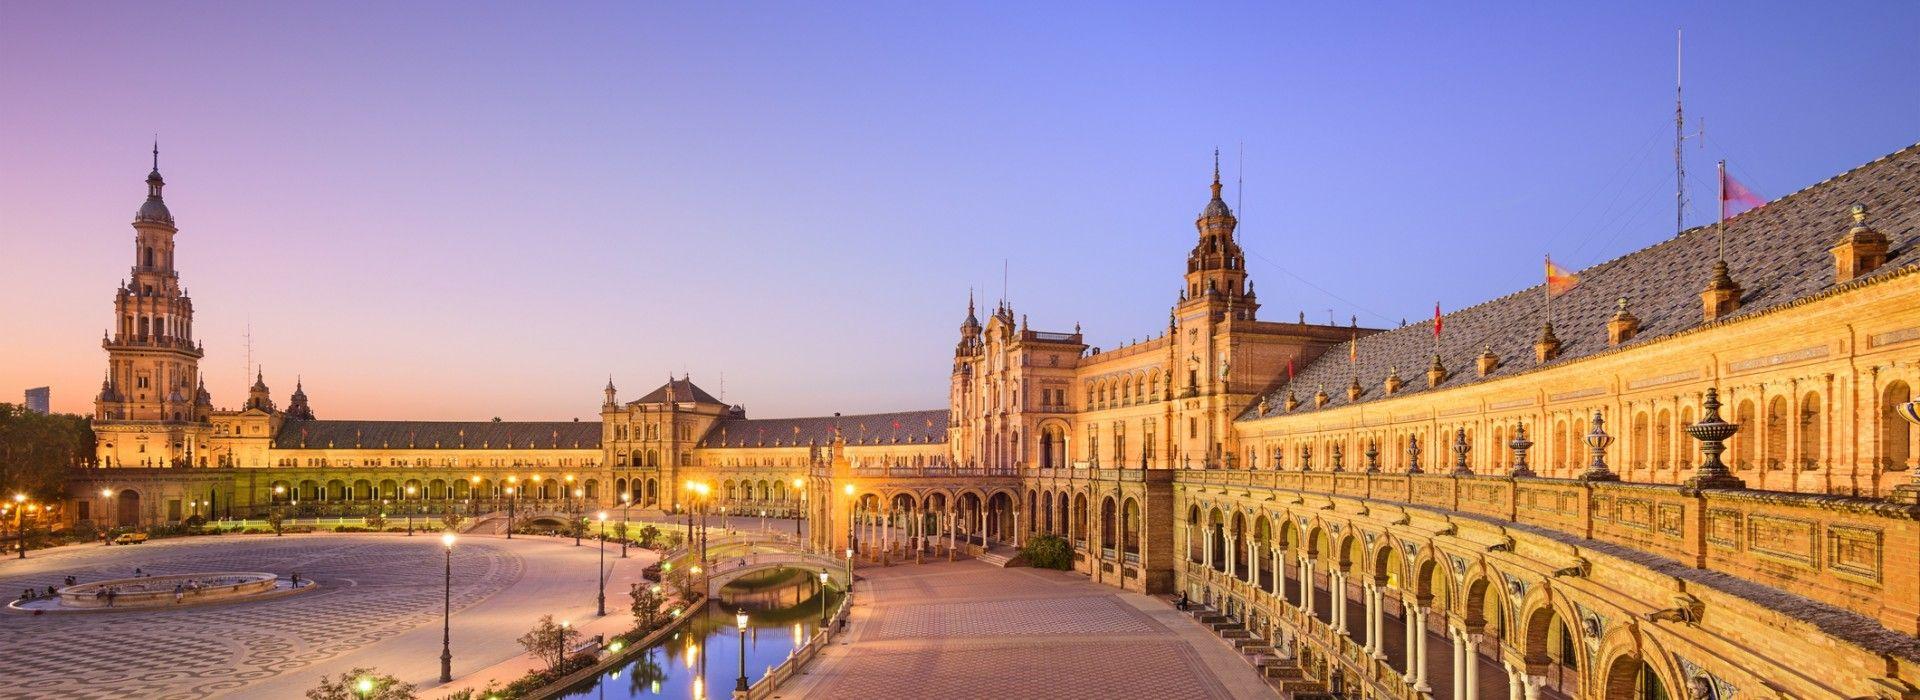 Adventure and sport activities Tours in Spain